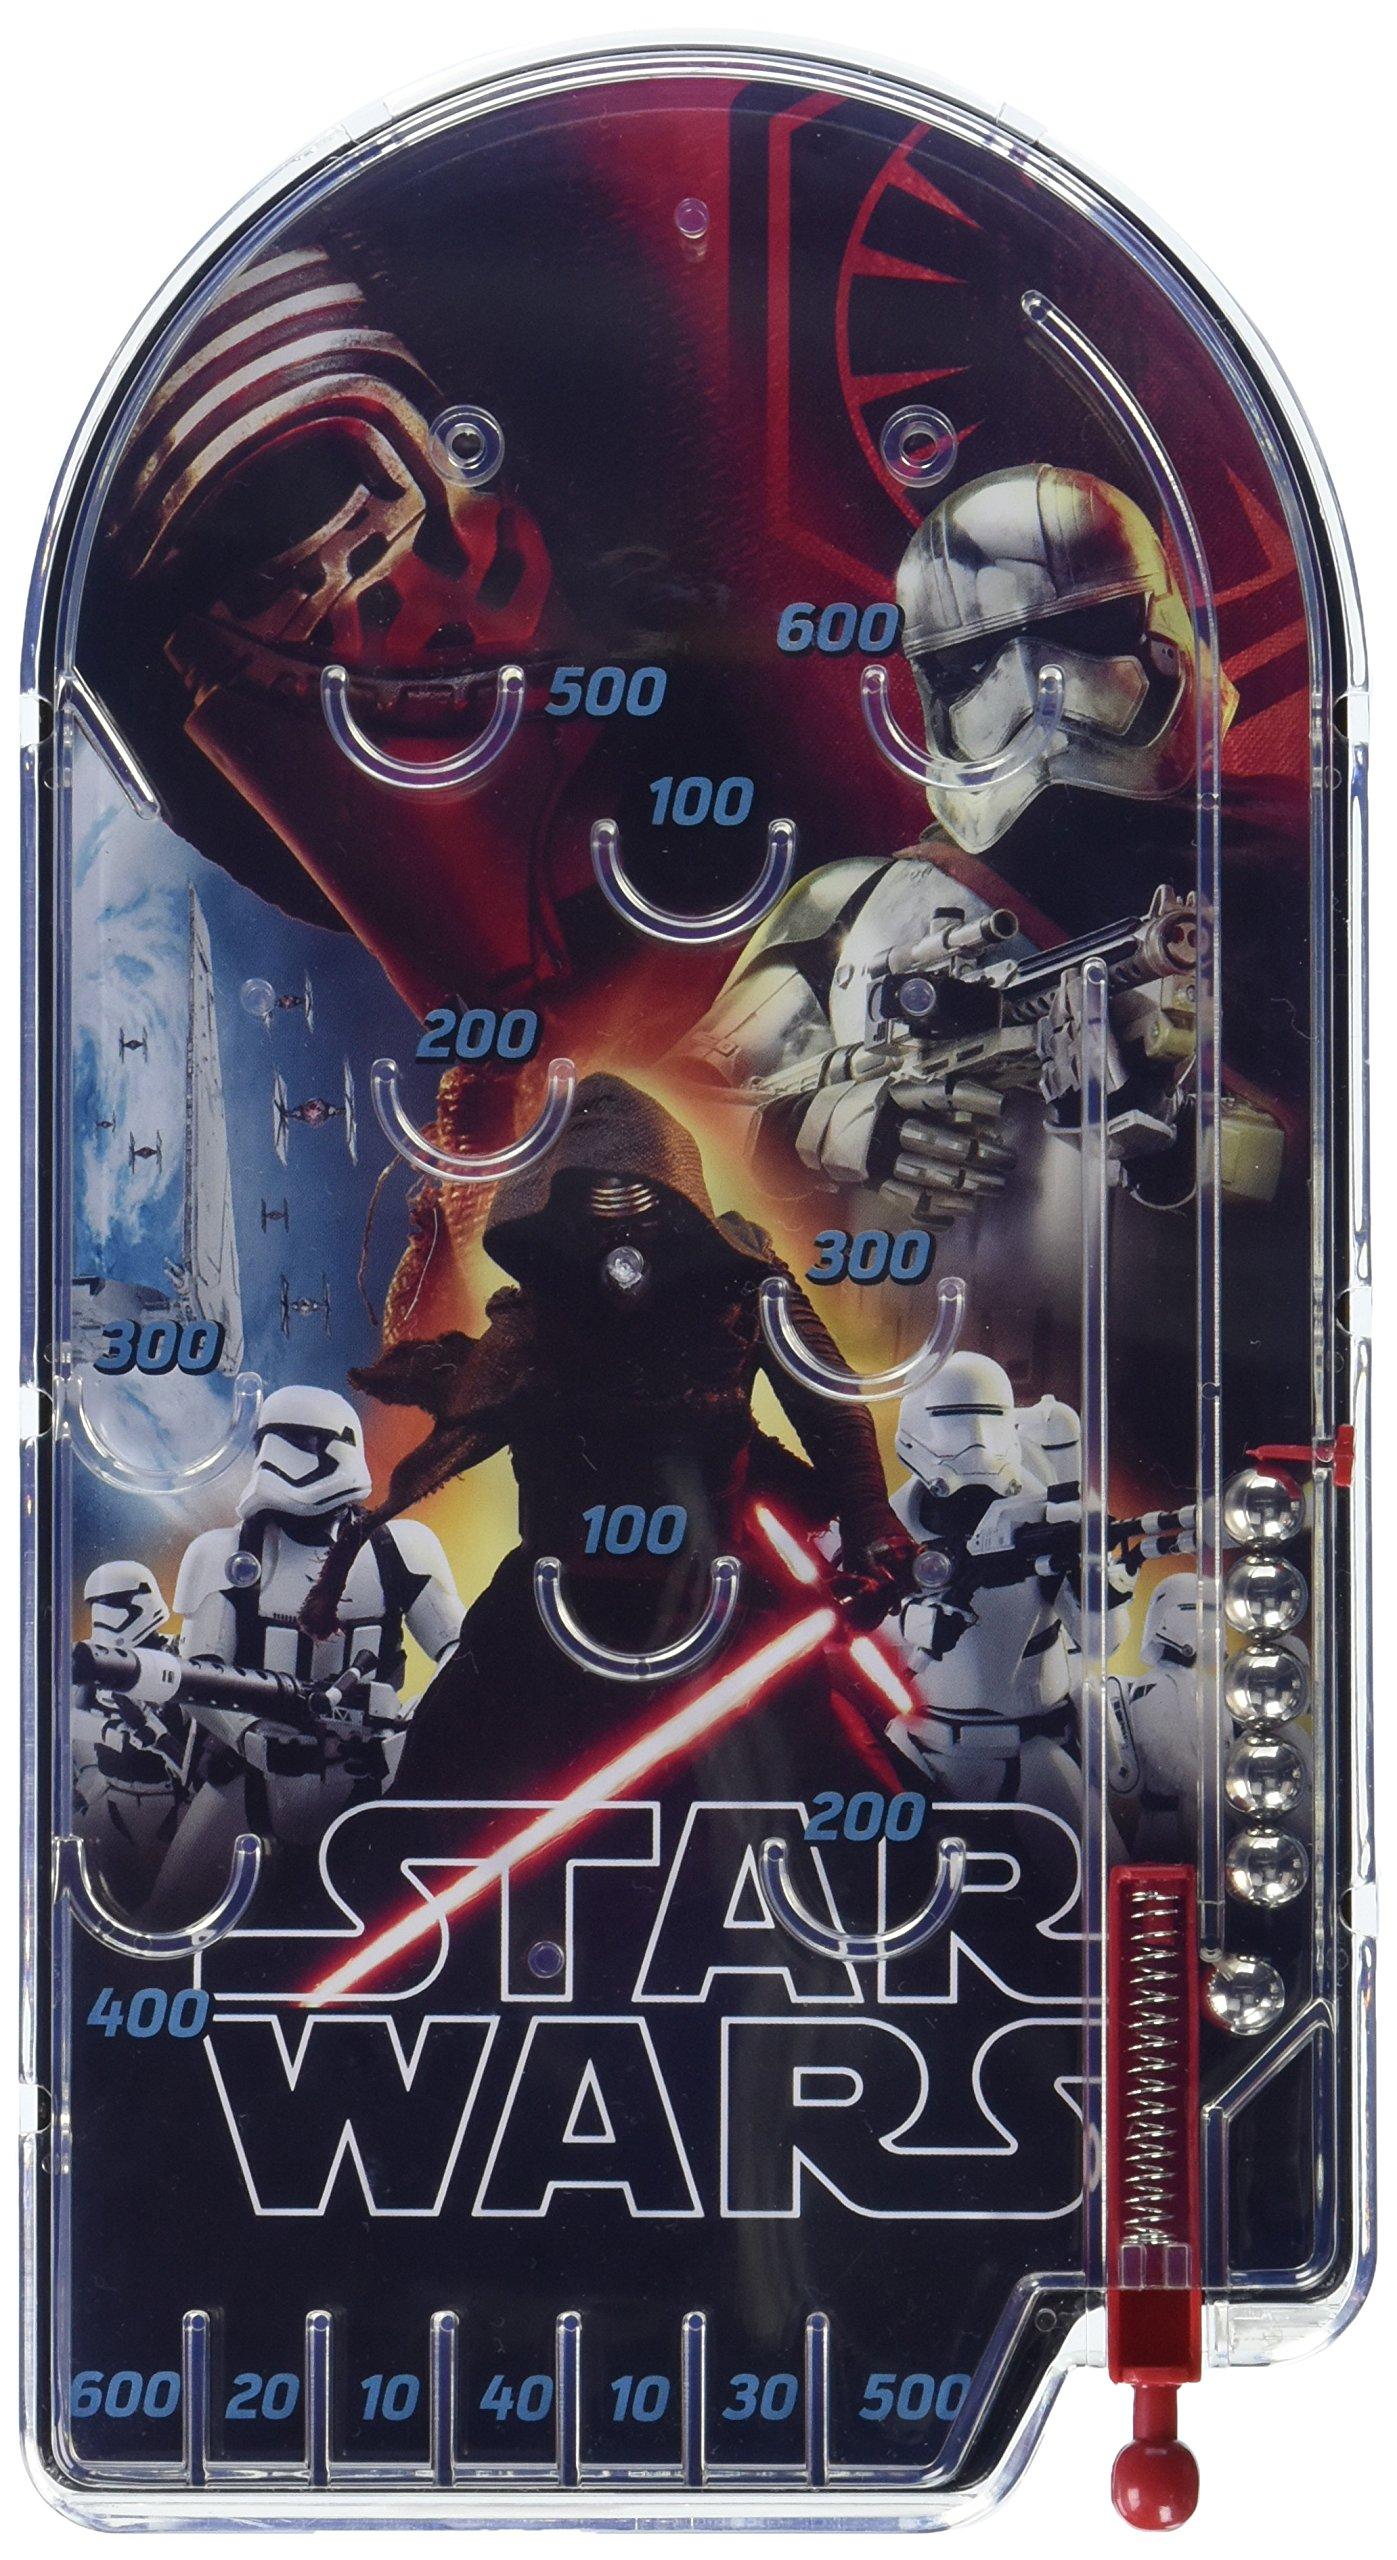 Star Wars Villains Pinball Game by Star Wars